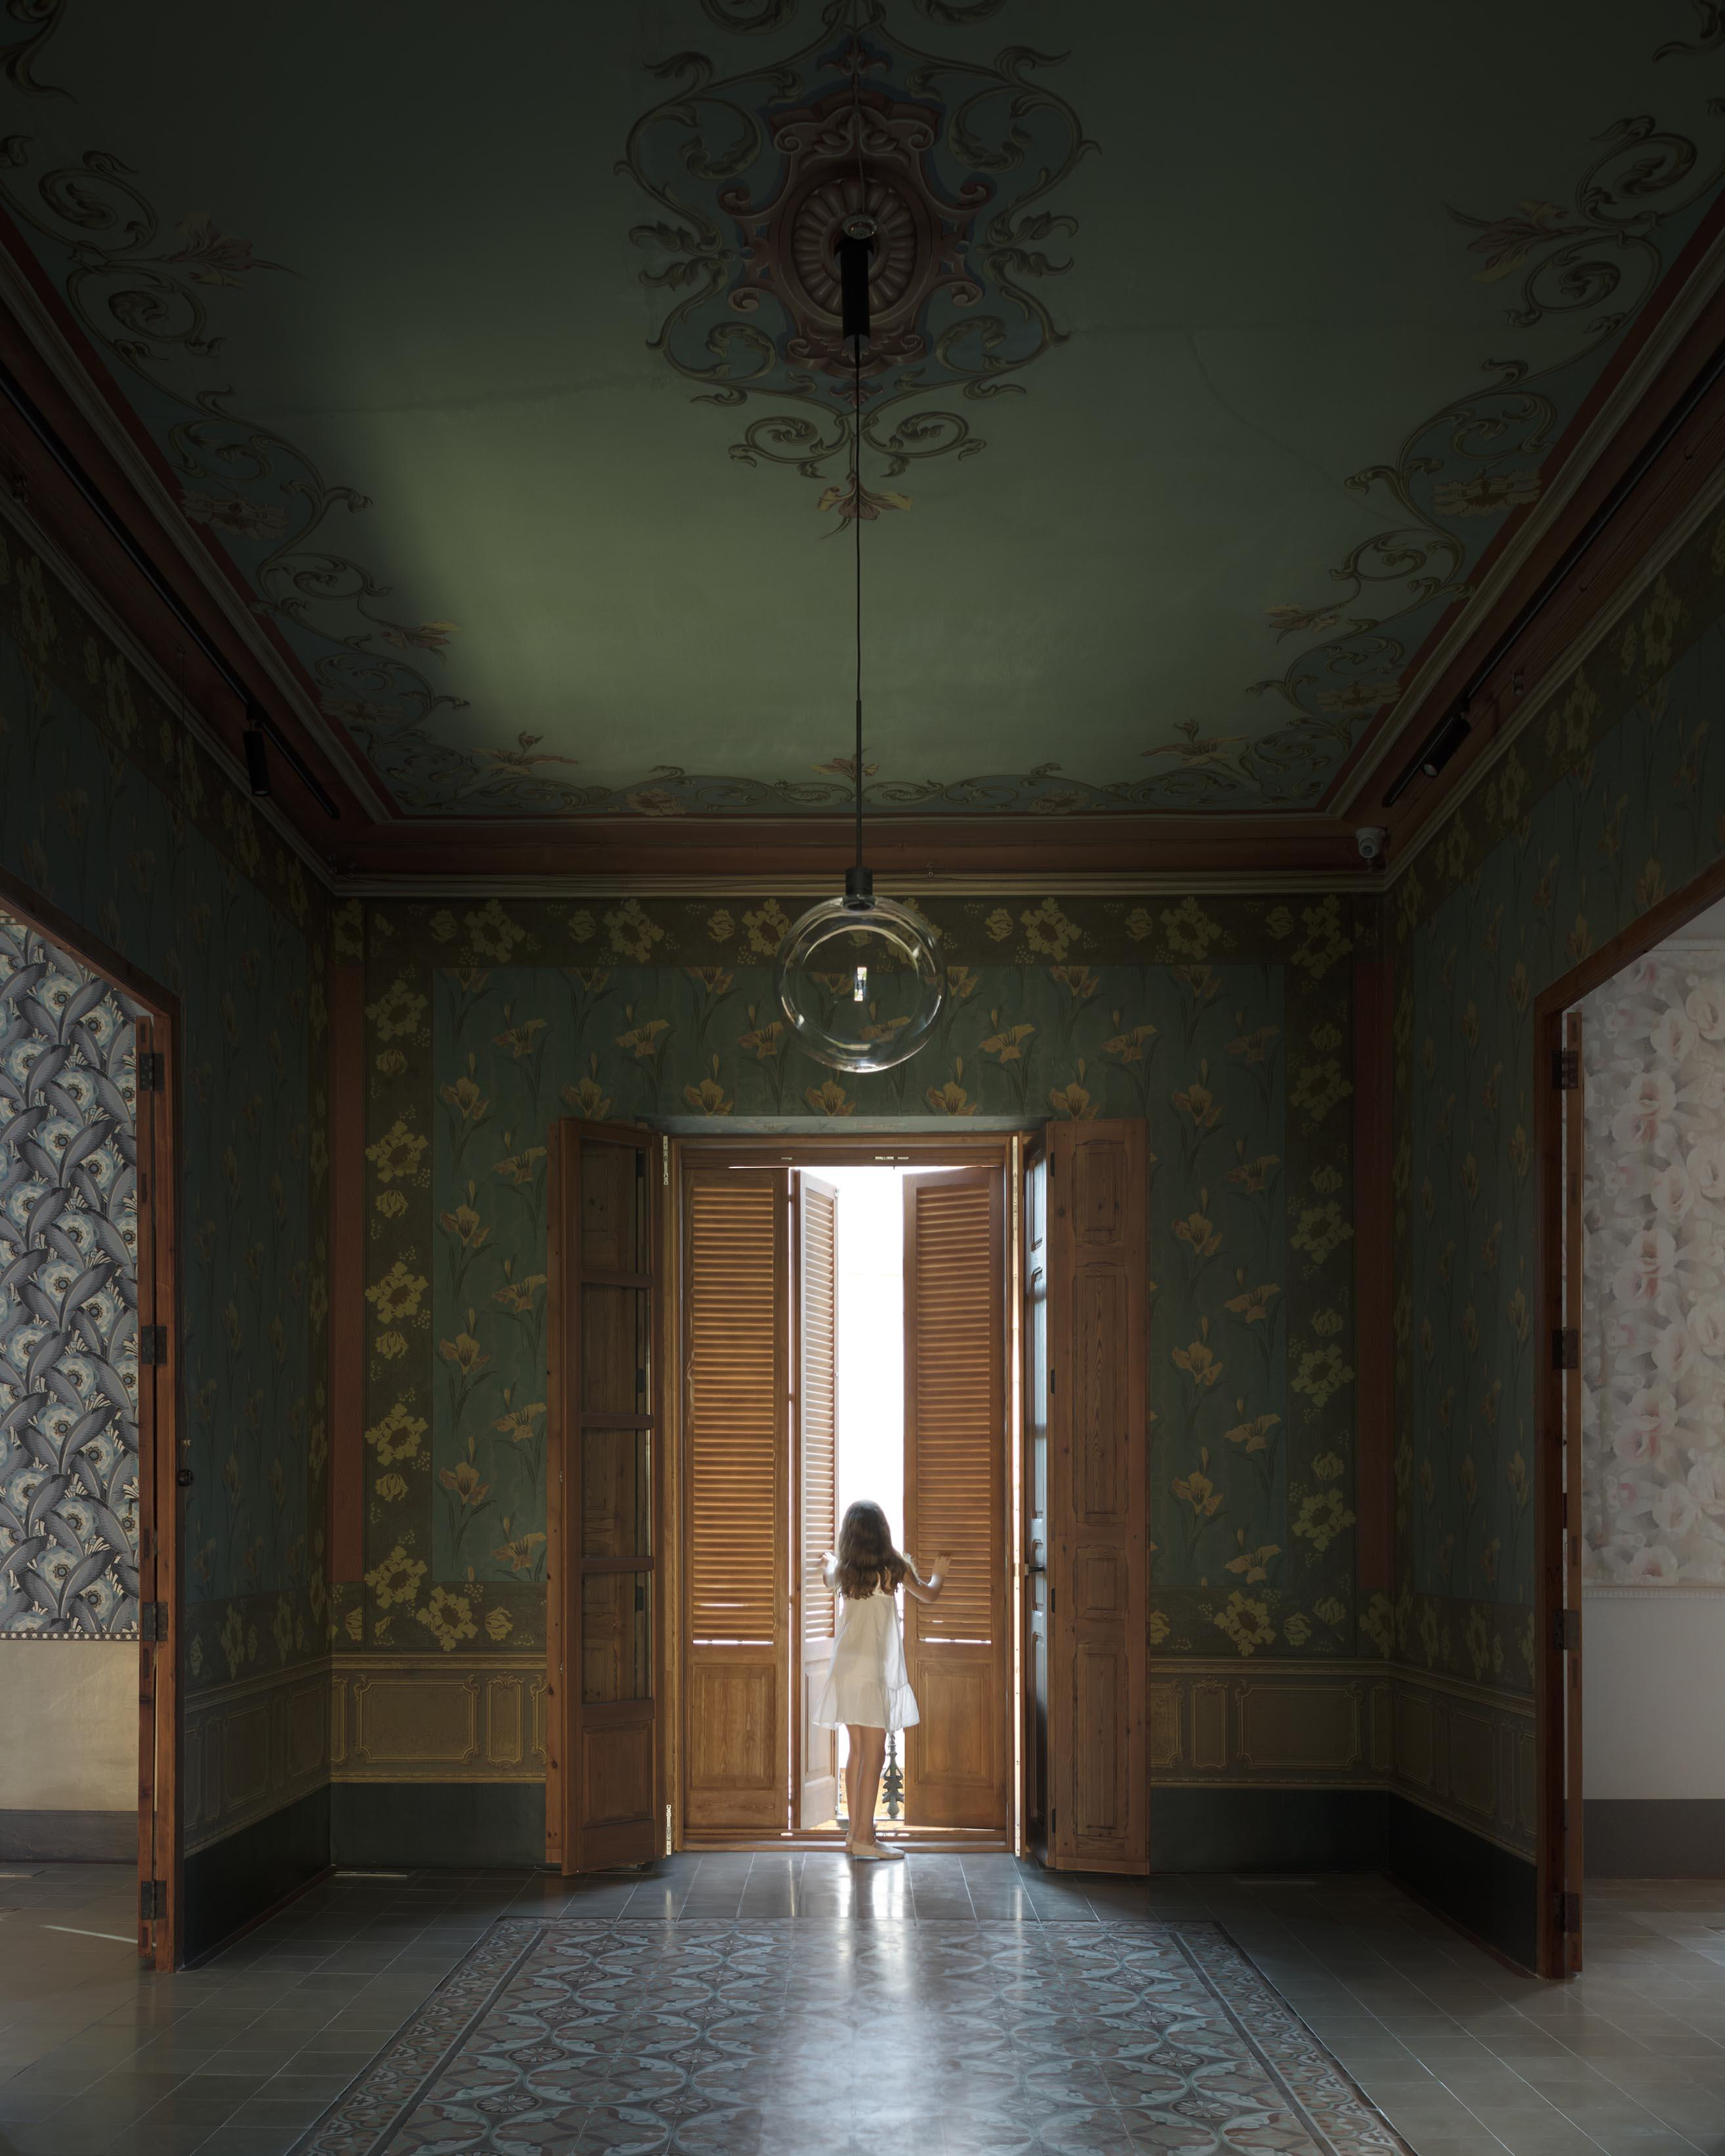 05 Museu Casa Ayora ©Milena Villalba 2020